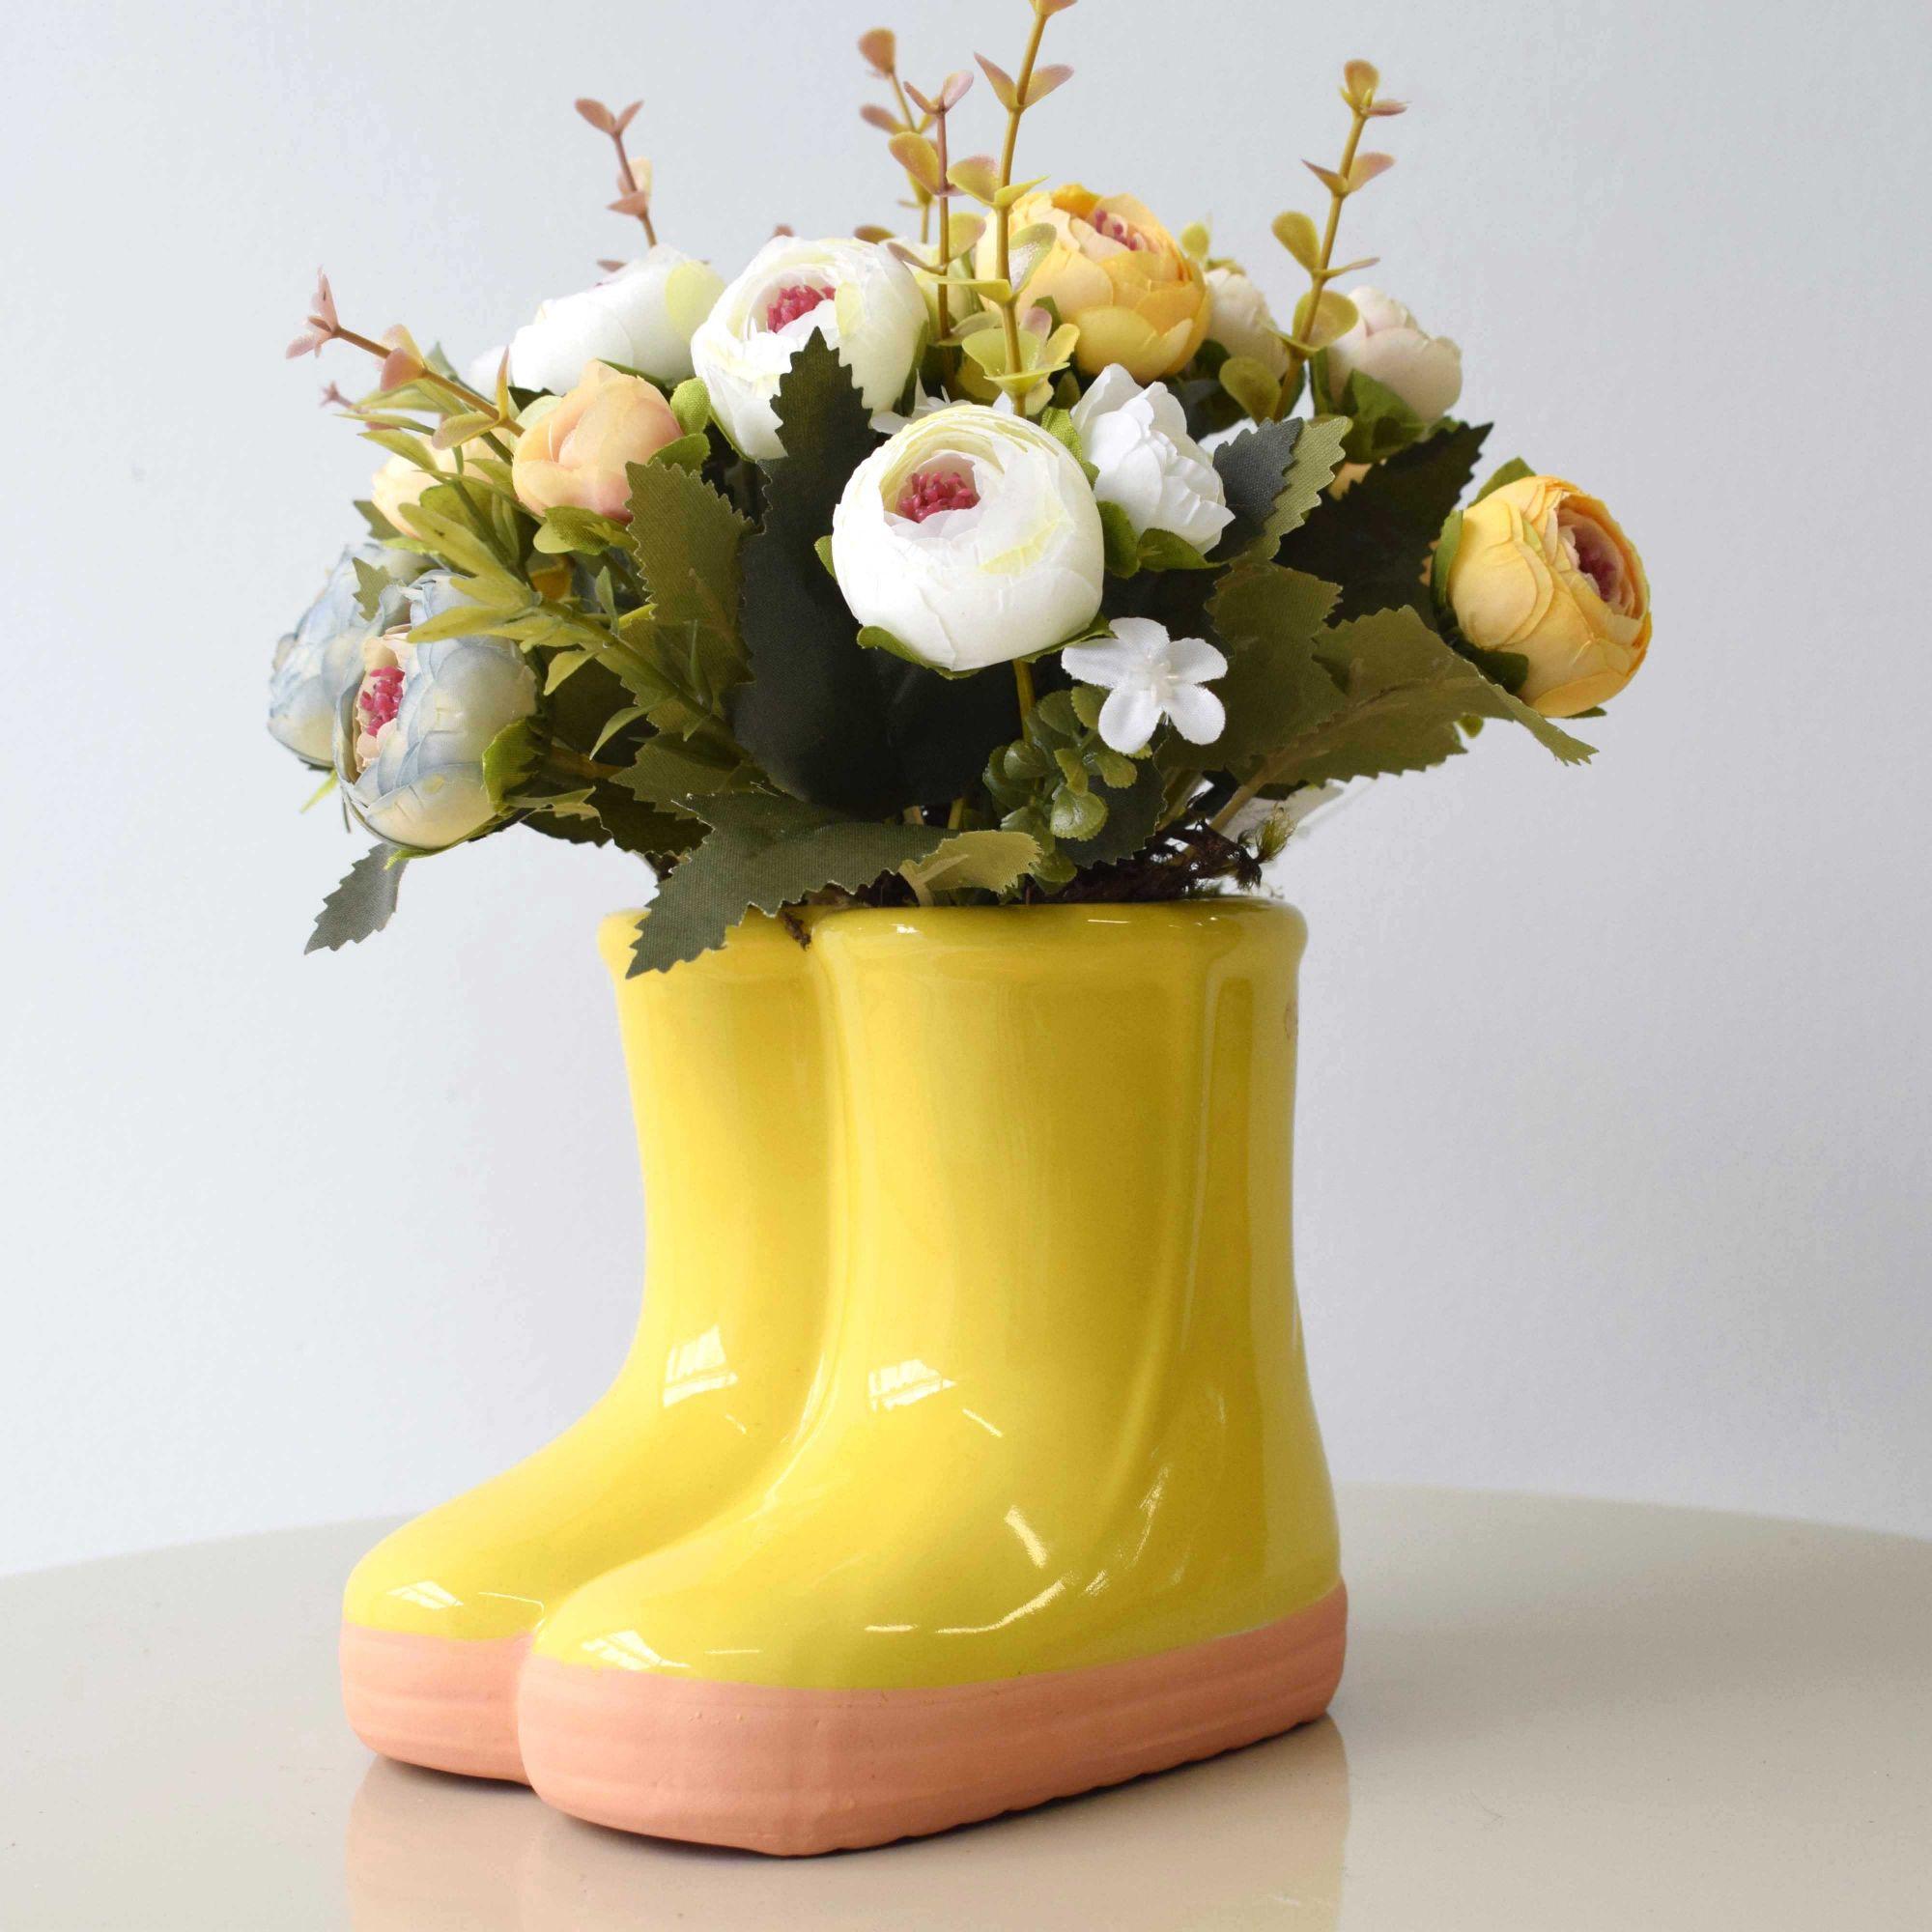 Arranjo de Flores Coloridas no Vaso de Botinha de Cerâmica